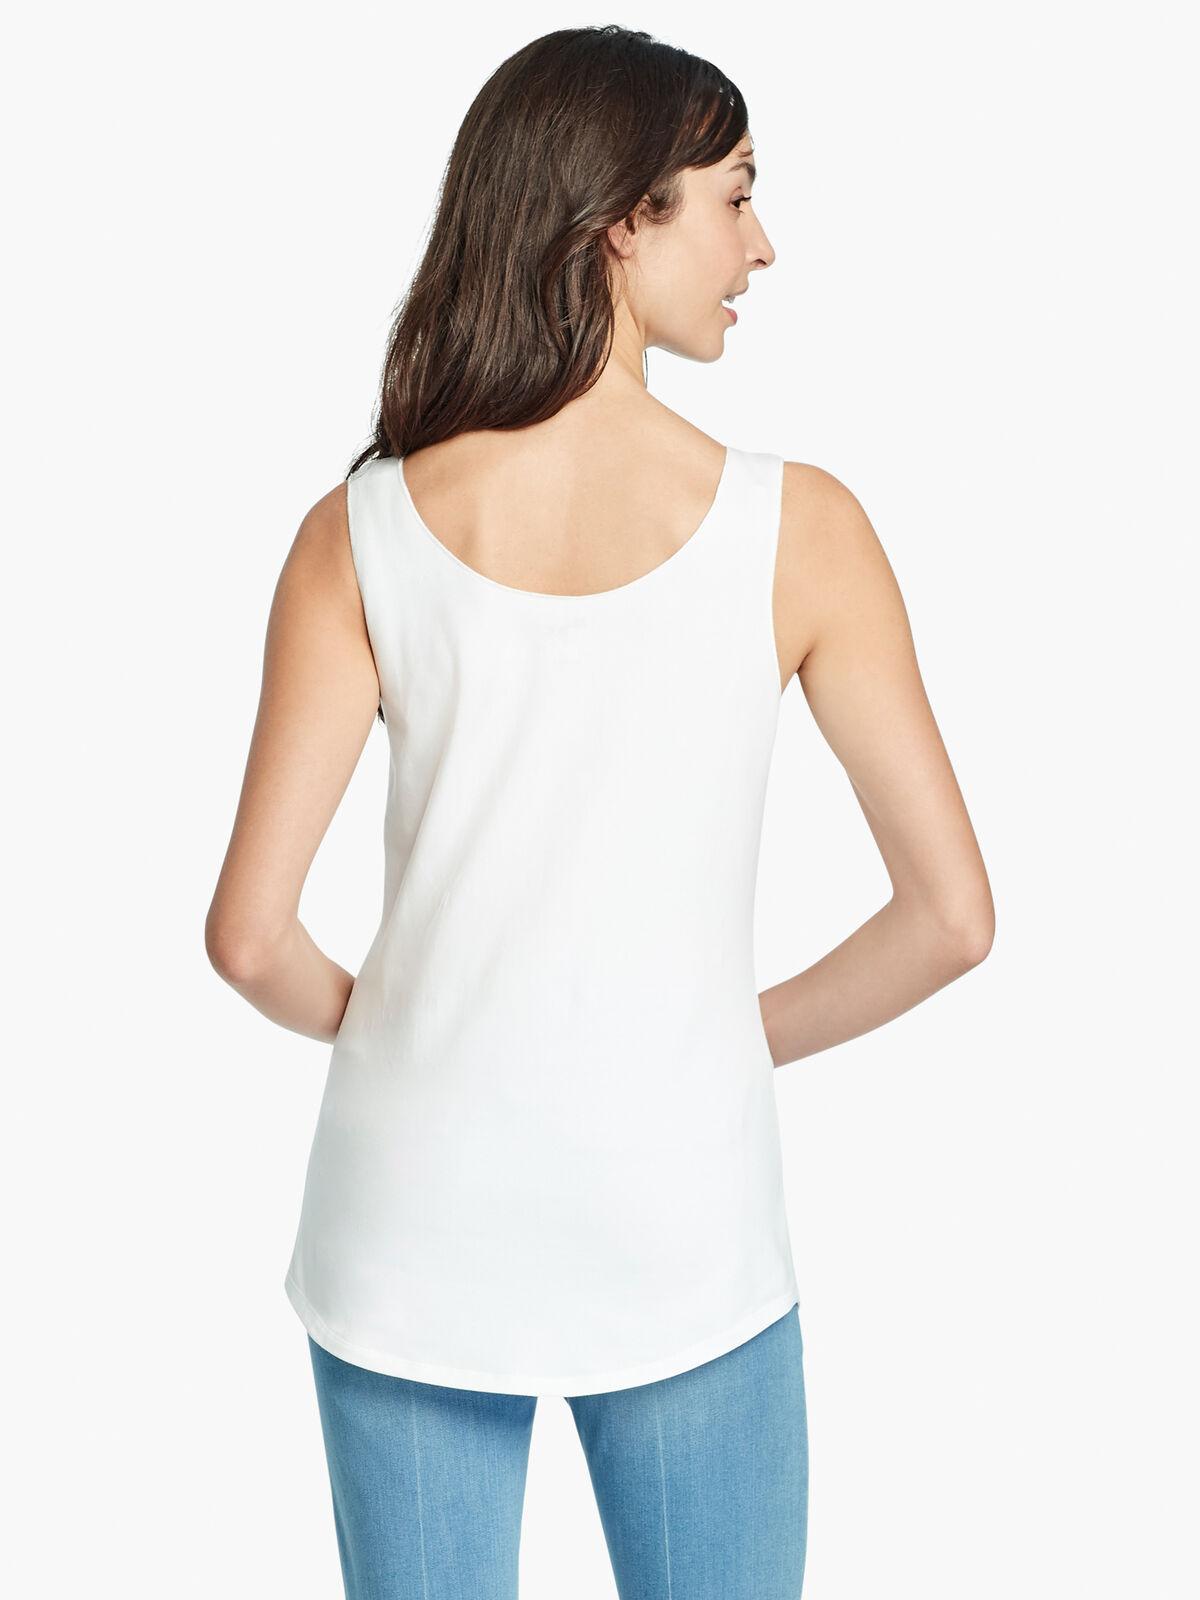 Shirt Tail Perfect Tank